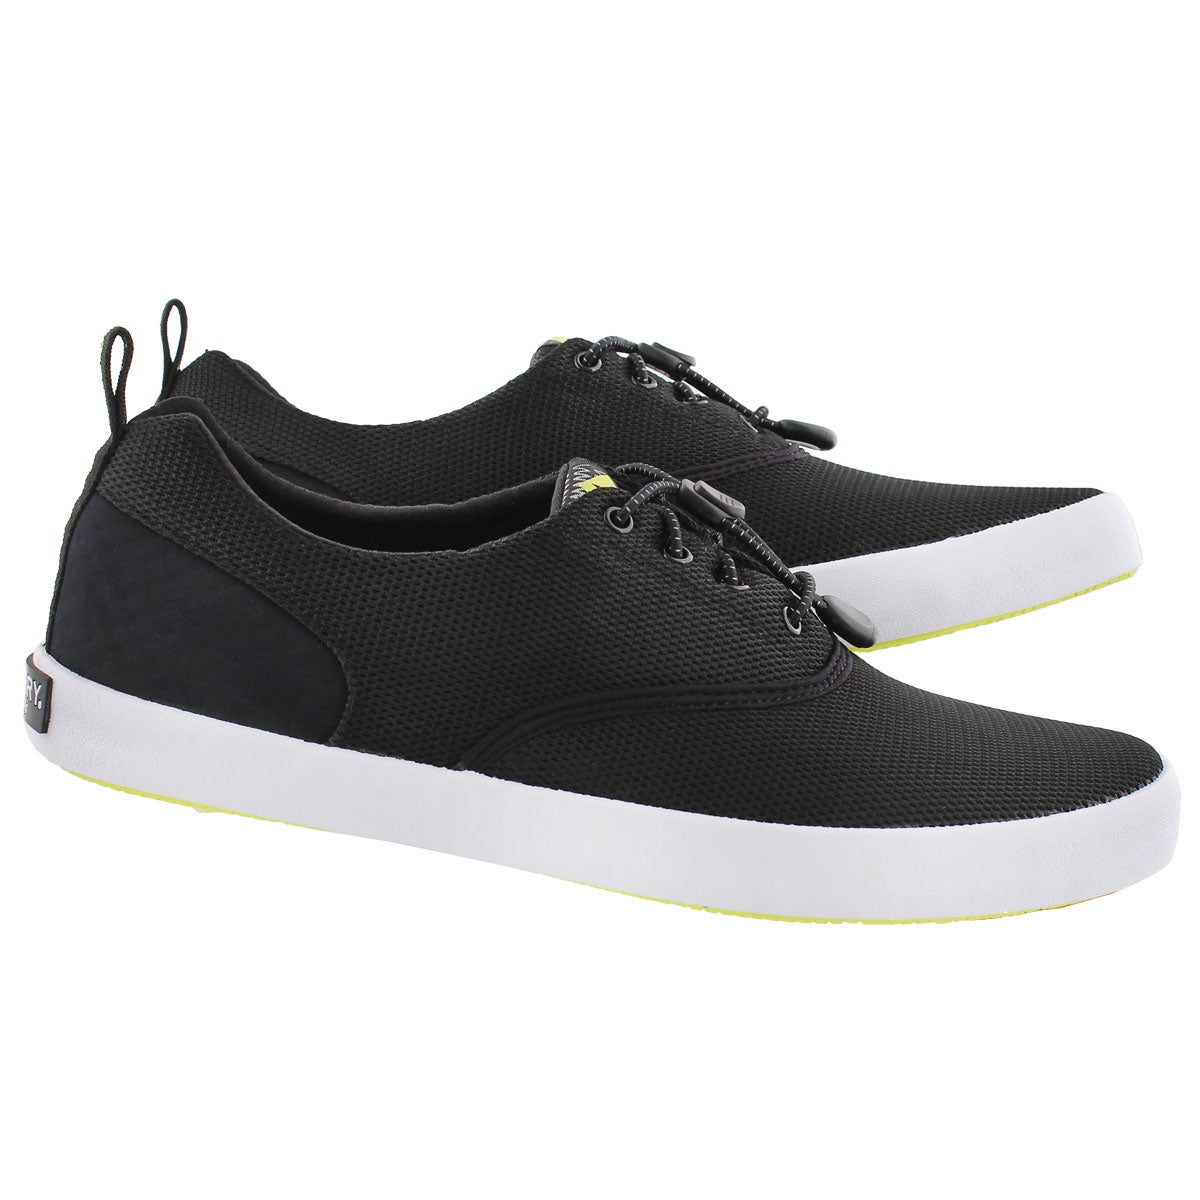 Mns Flex Deck black CVO sneaker